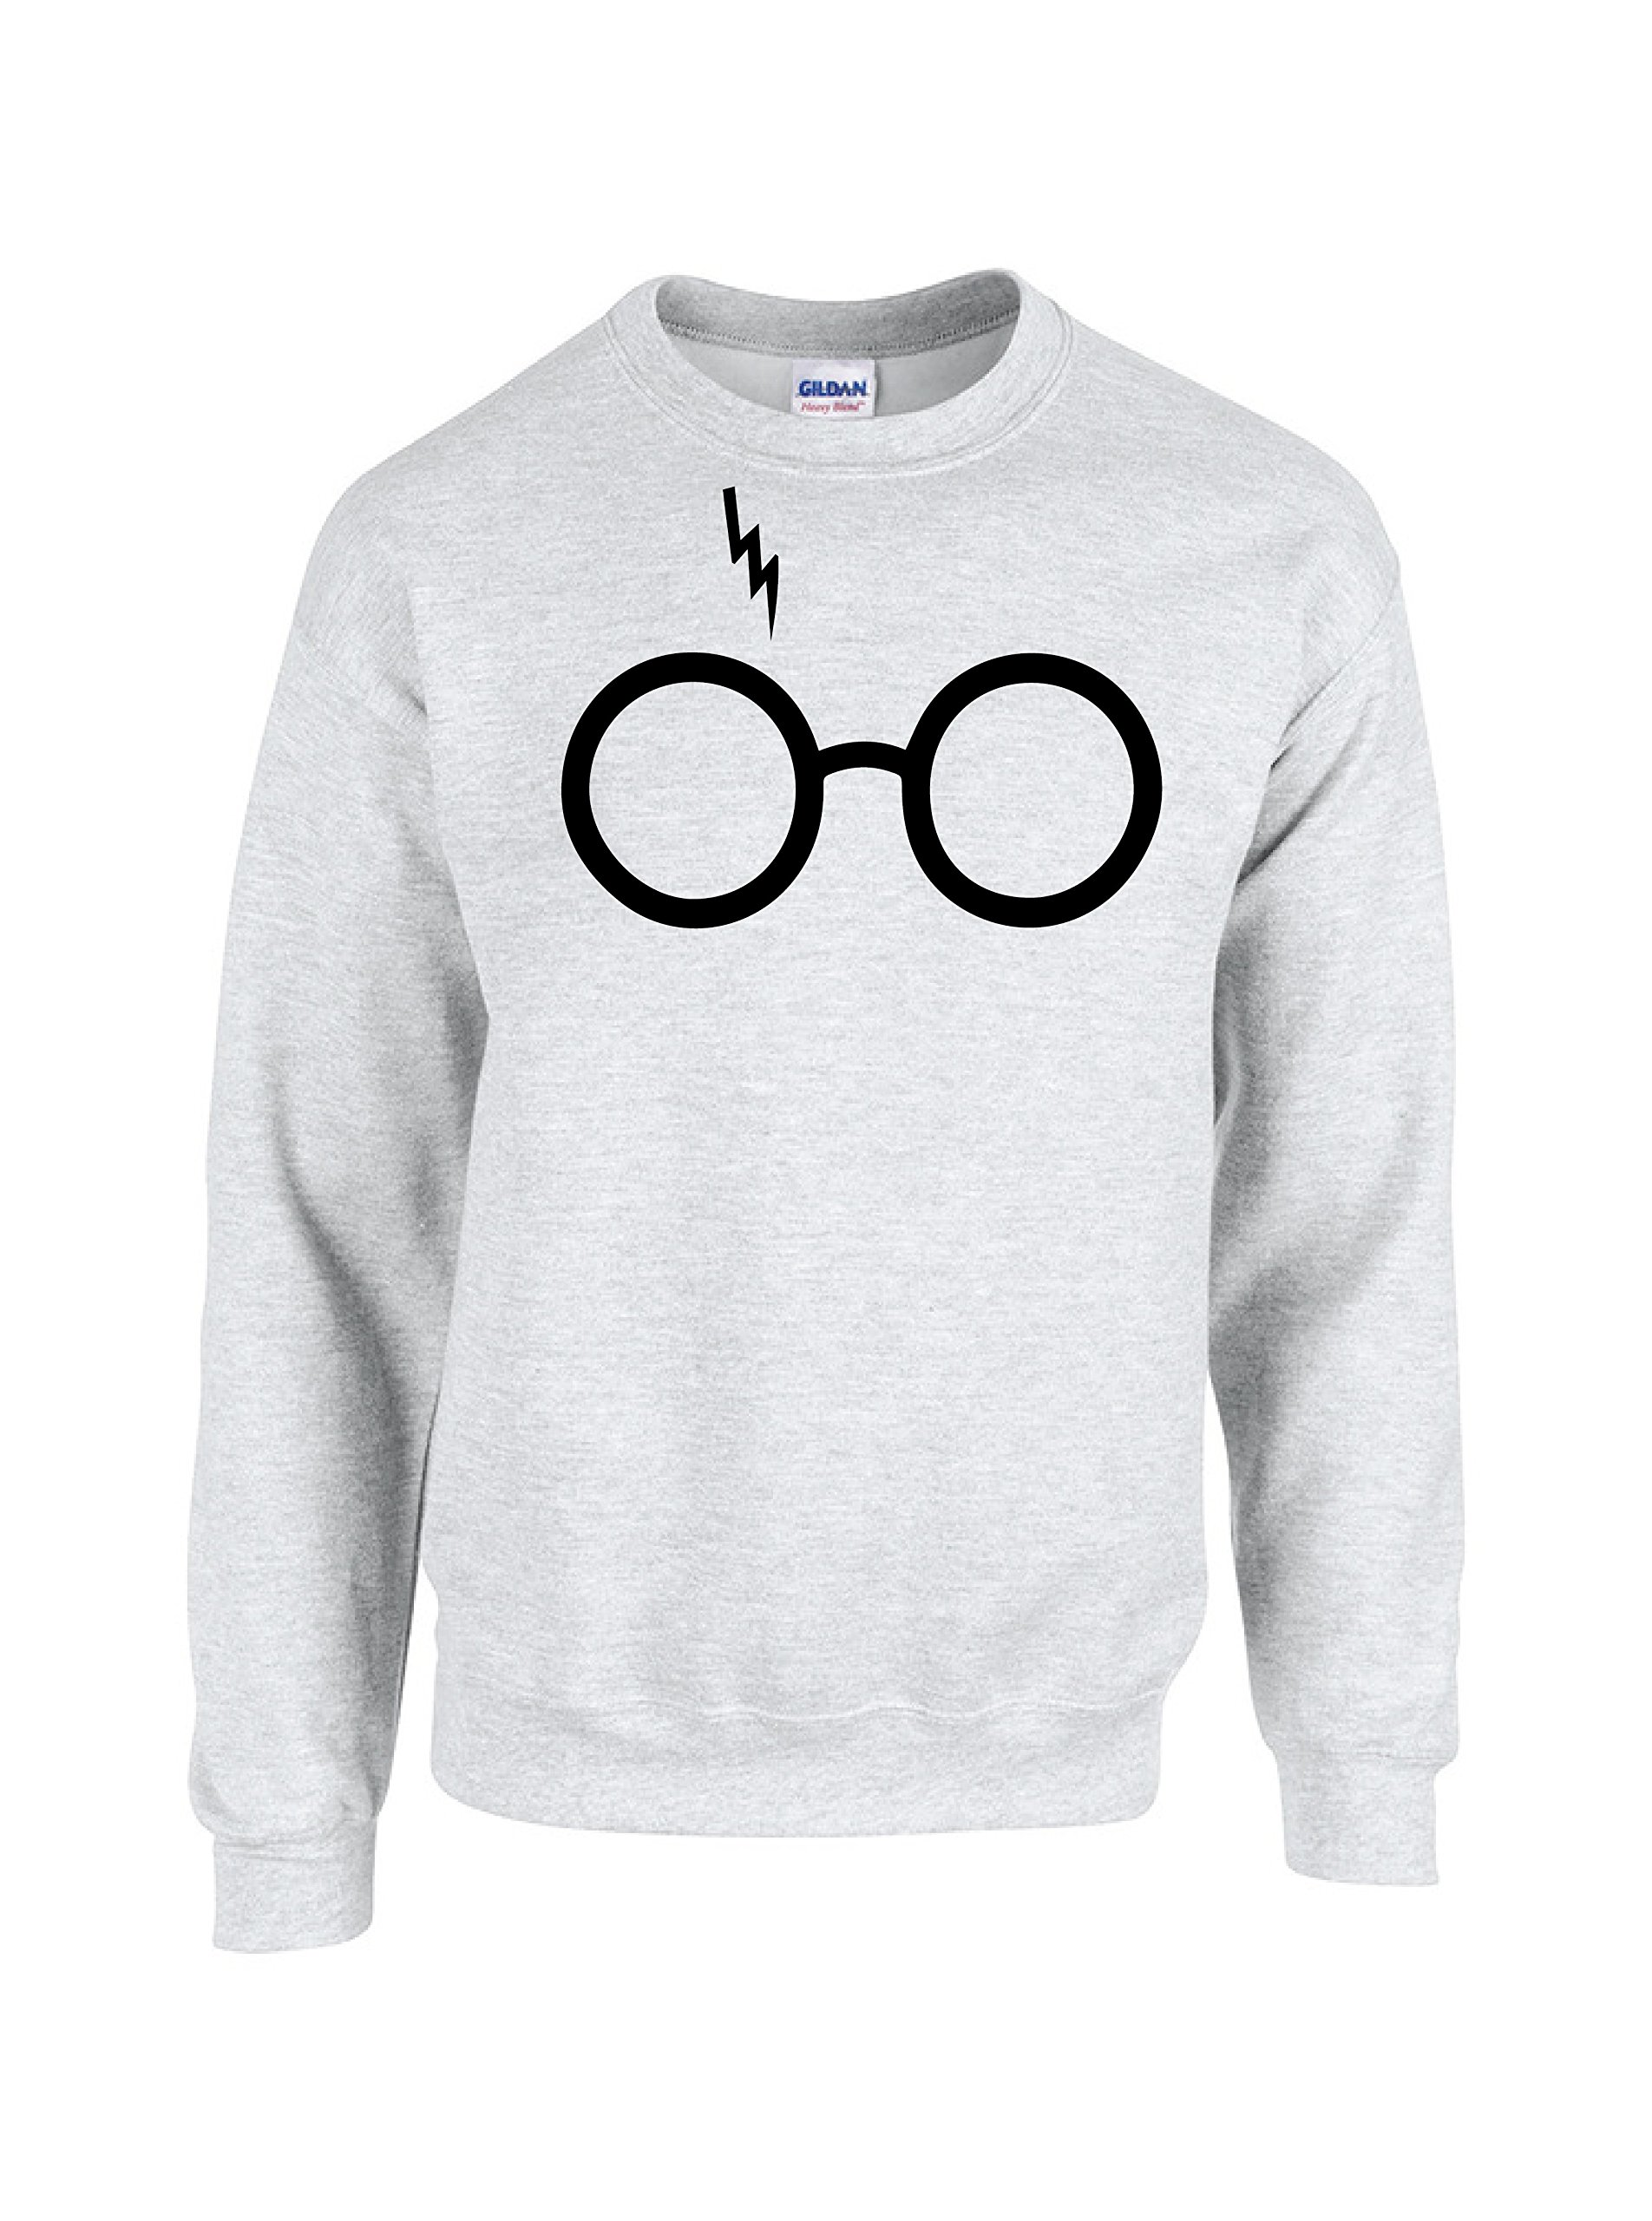 Harry Potter Glasses Sweater Crewneck Medium White